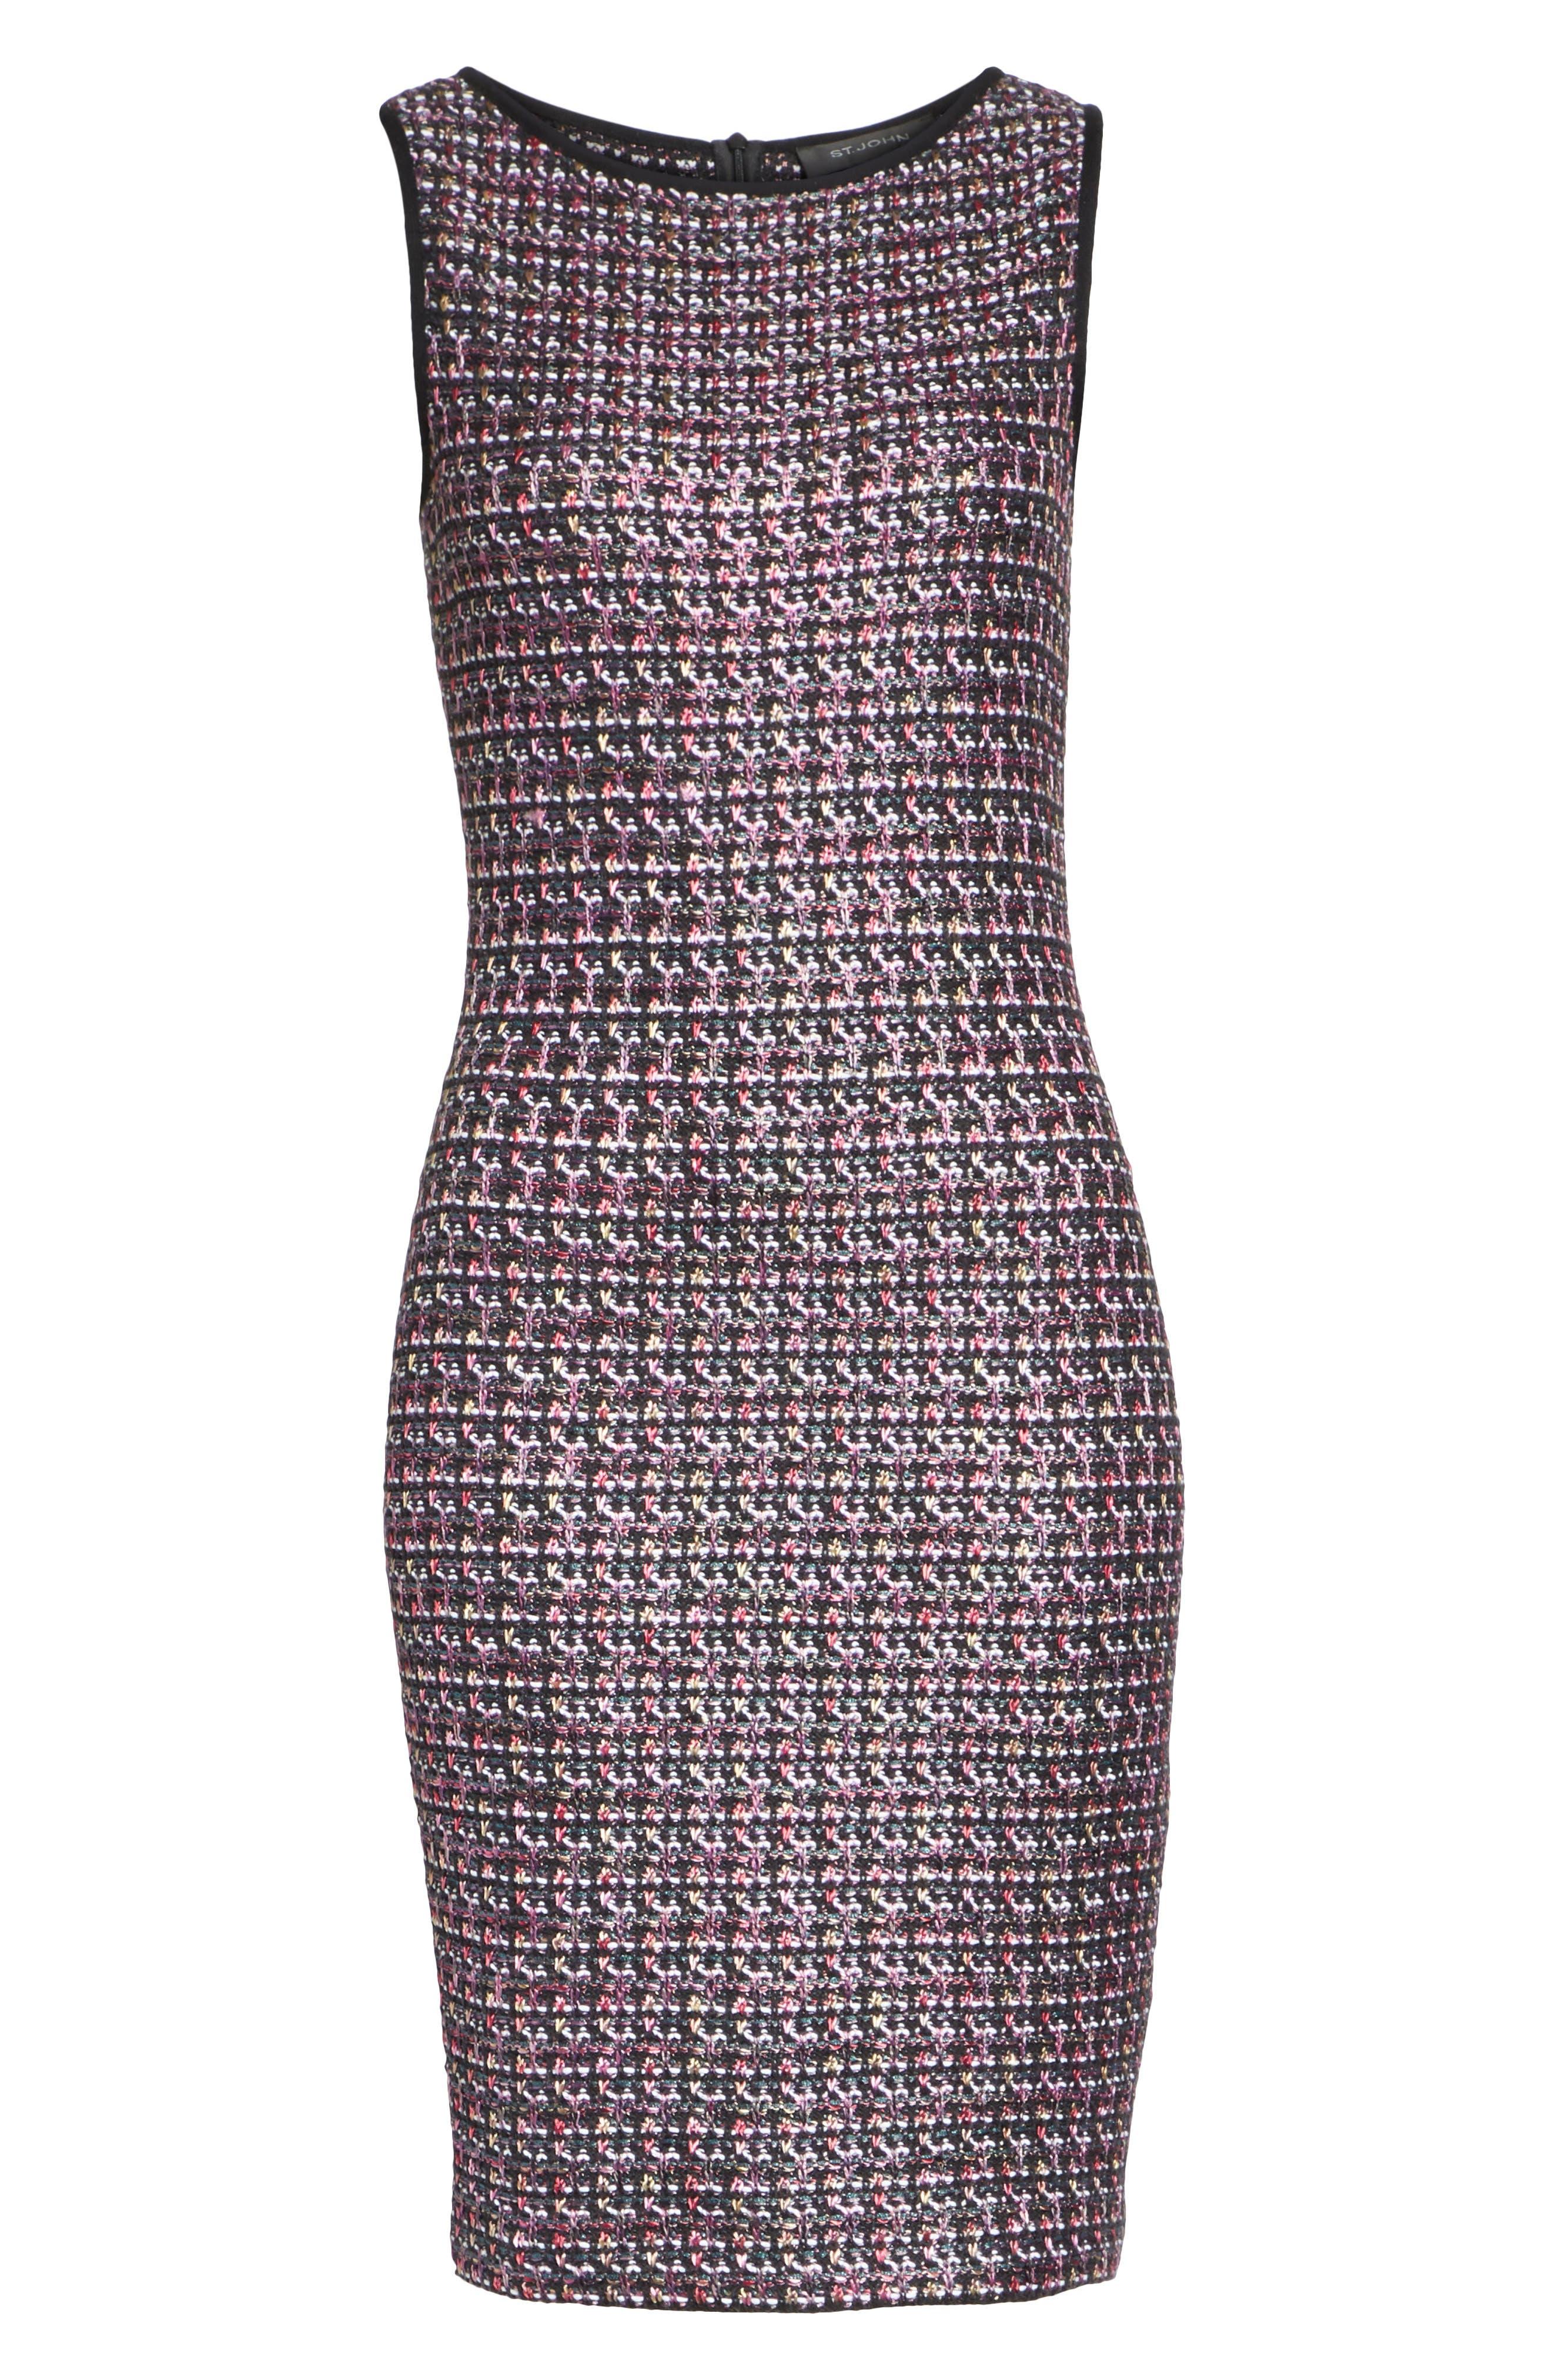 Painterly Sheen Tweed Knit Dress,                             Alternate thumbnail 6, color,                             GRANITE MULTI